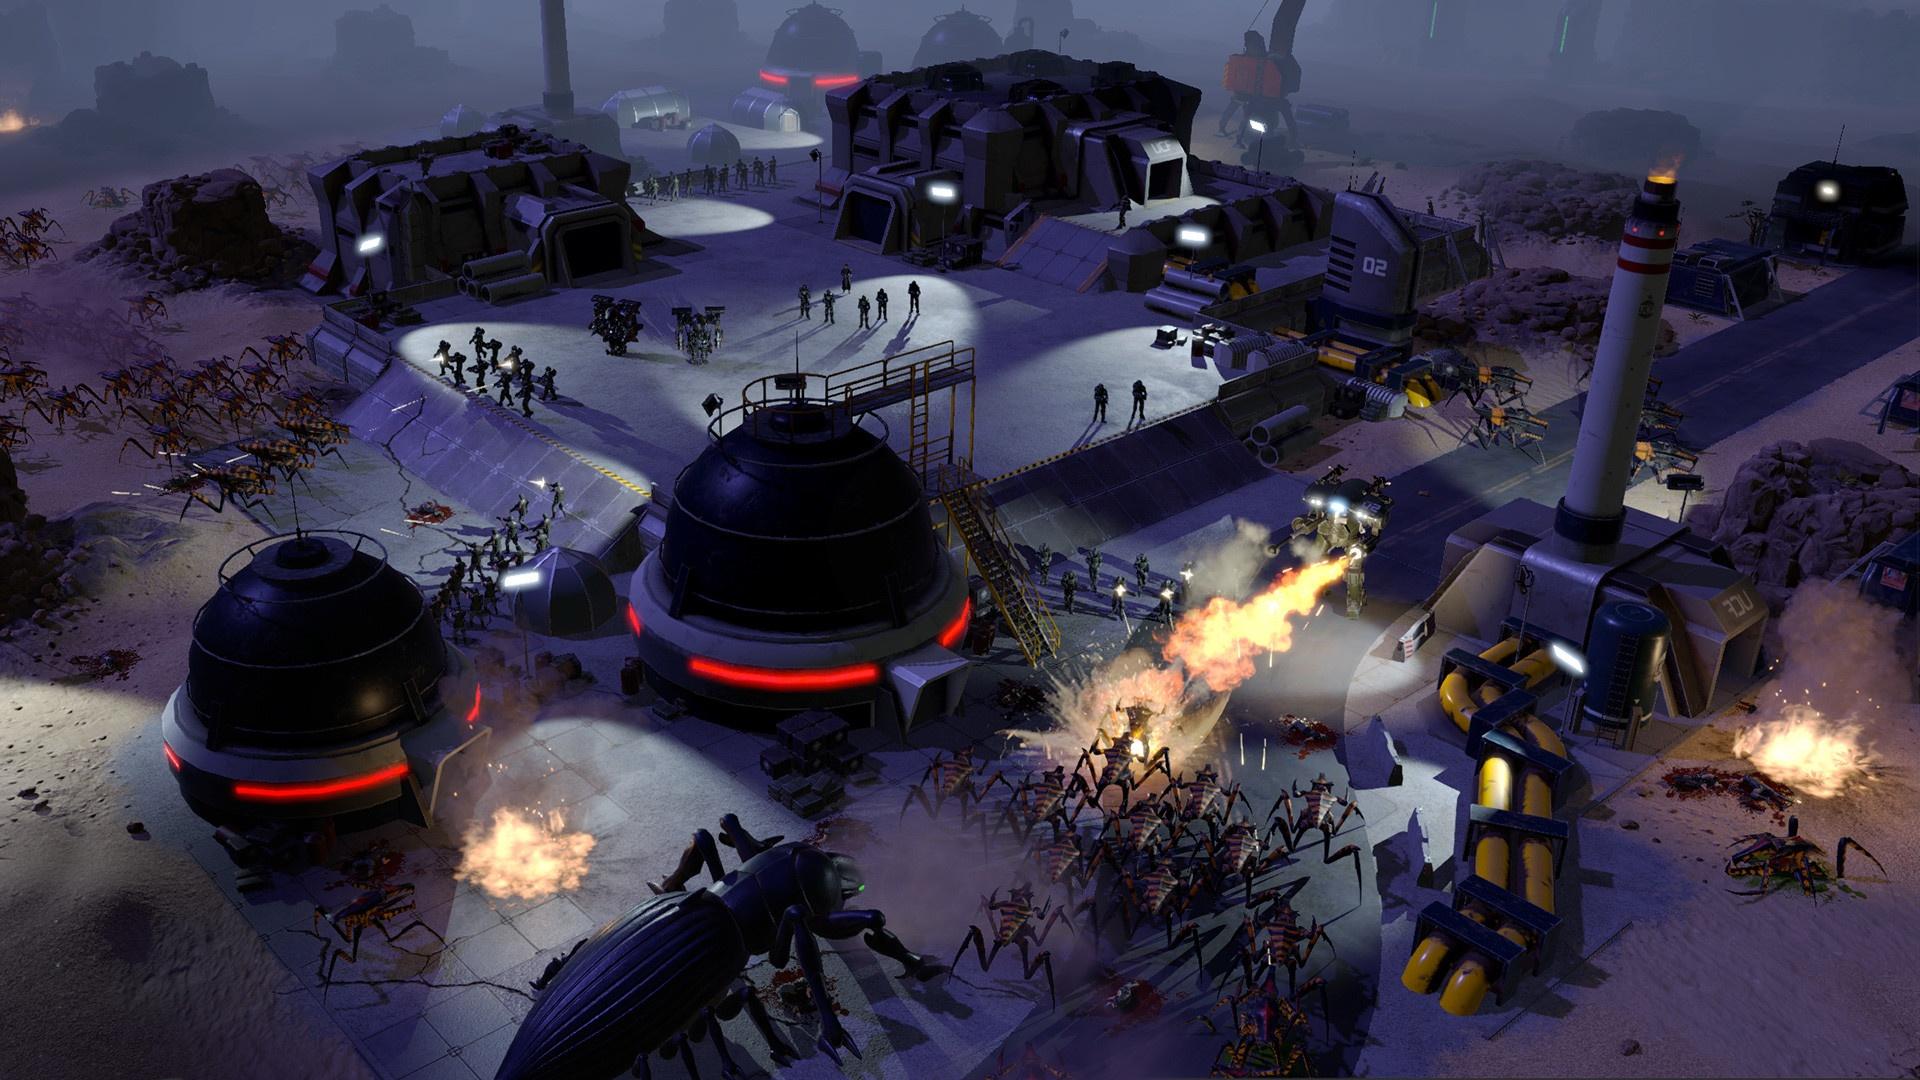 Starship Troopers — Terran Command: готовится новая игра по «Звёздному десанту»